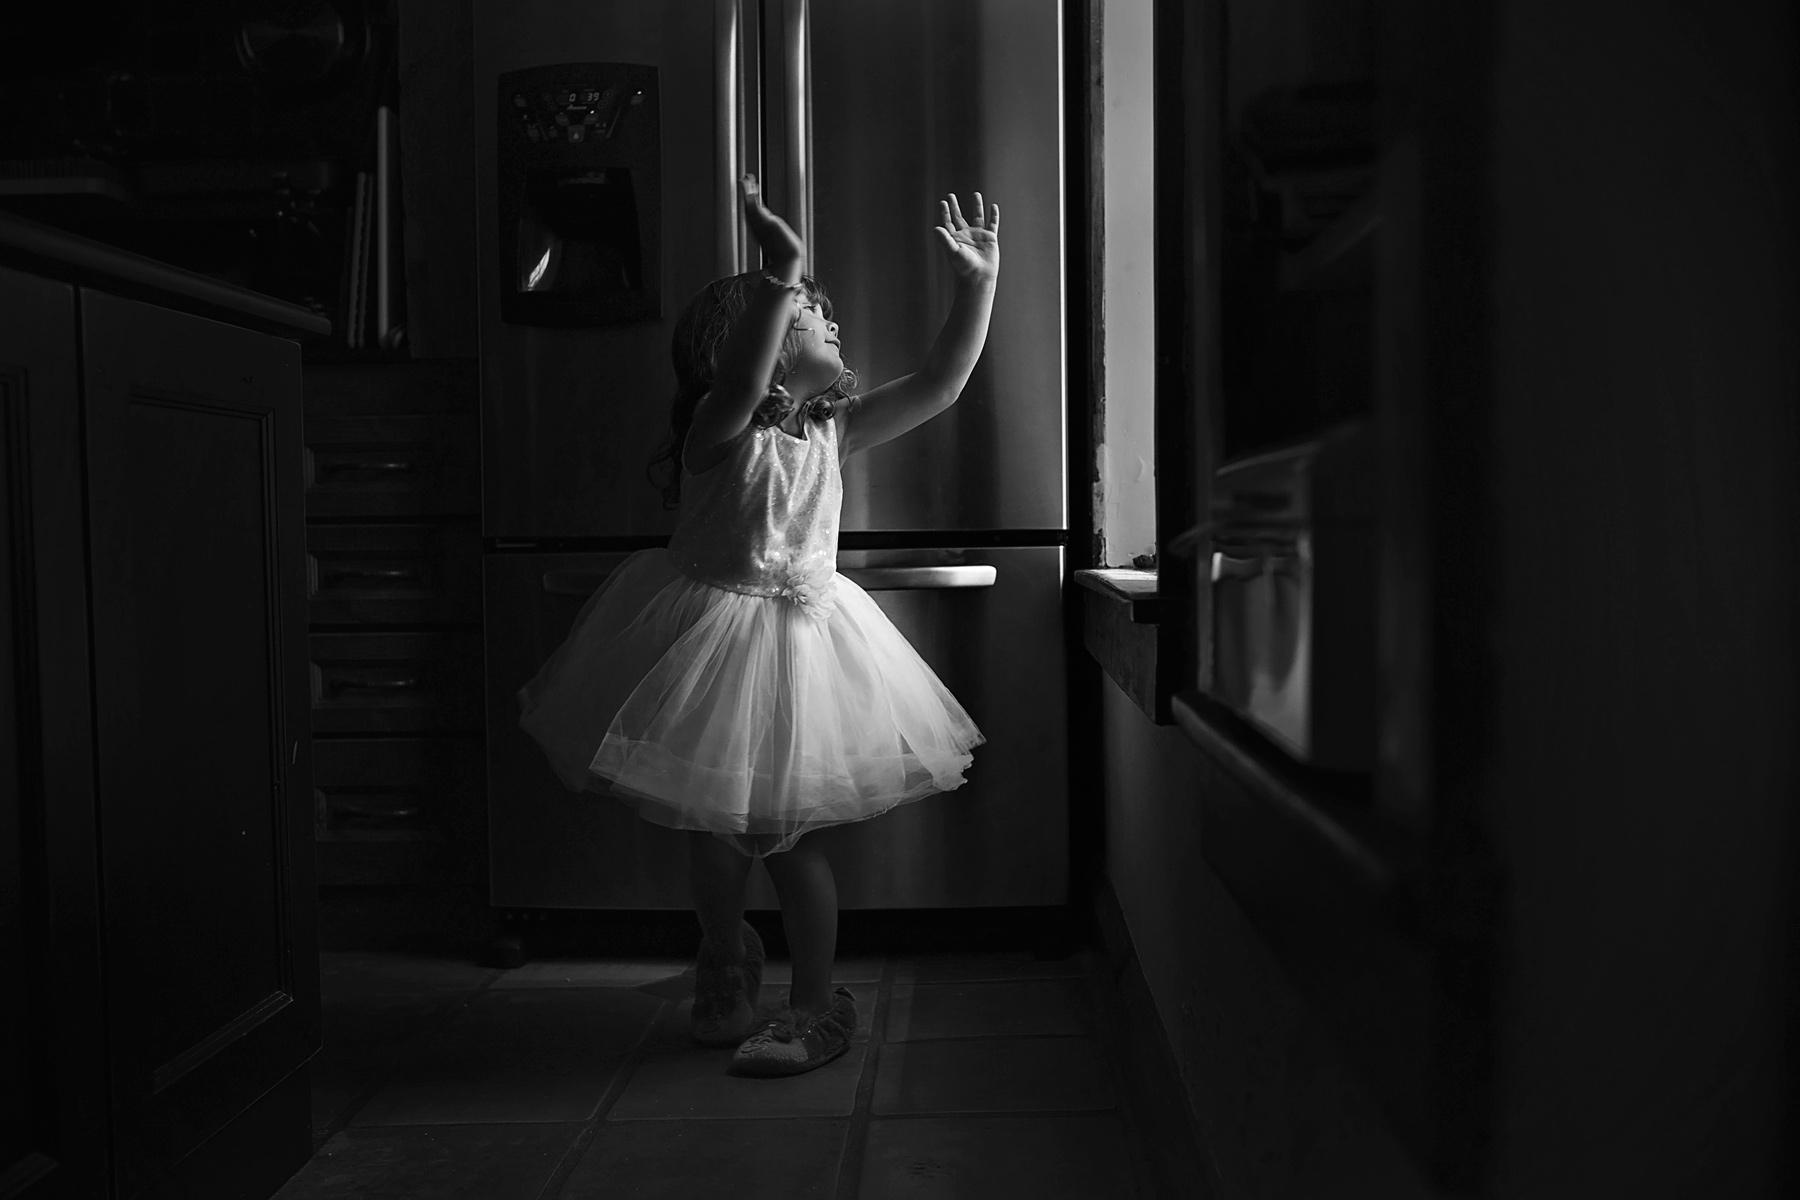 little girl dances in ballerina dress in the kitchen